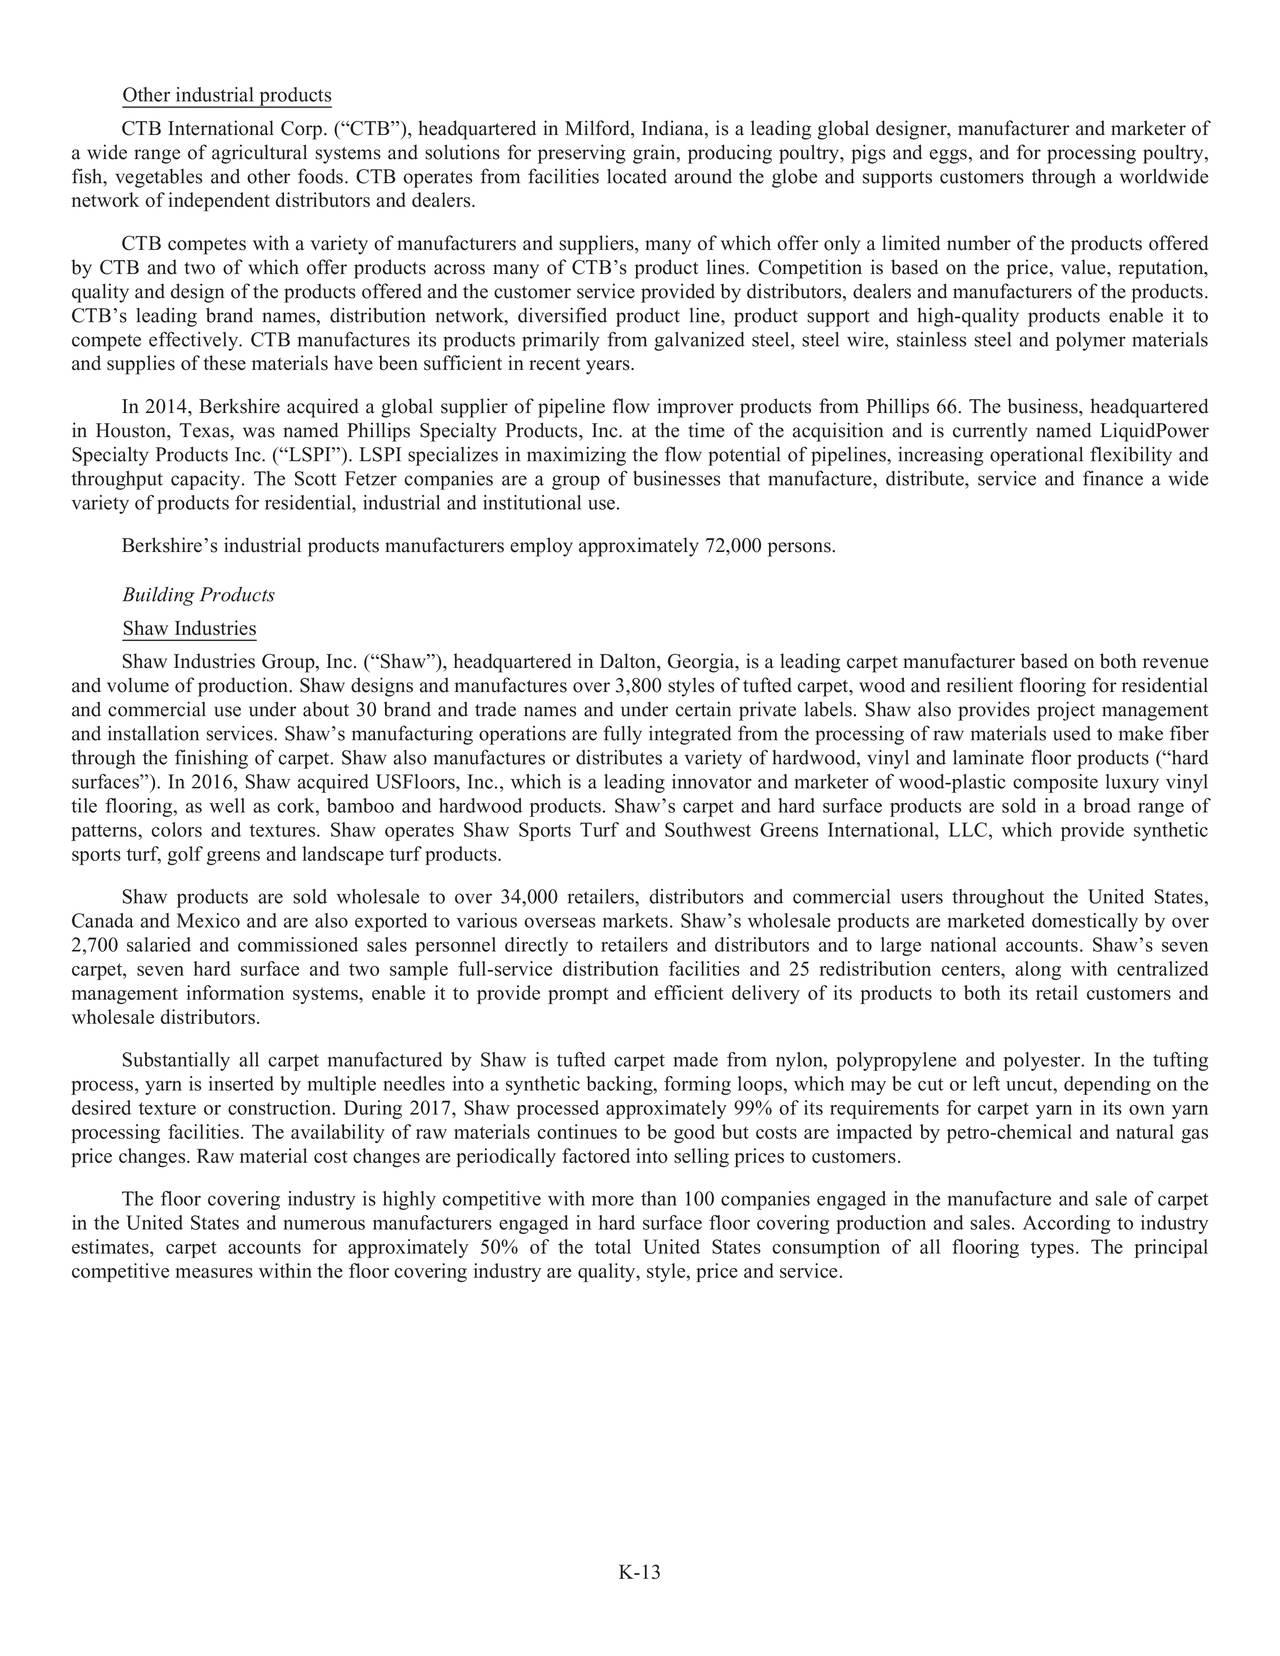 Berkshire Hathaway 2017 Annual Letter - Berkshire Hathaway ... - photo#44